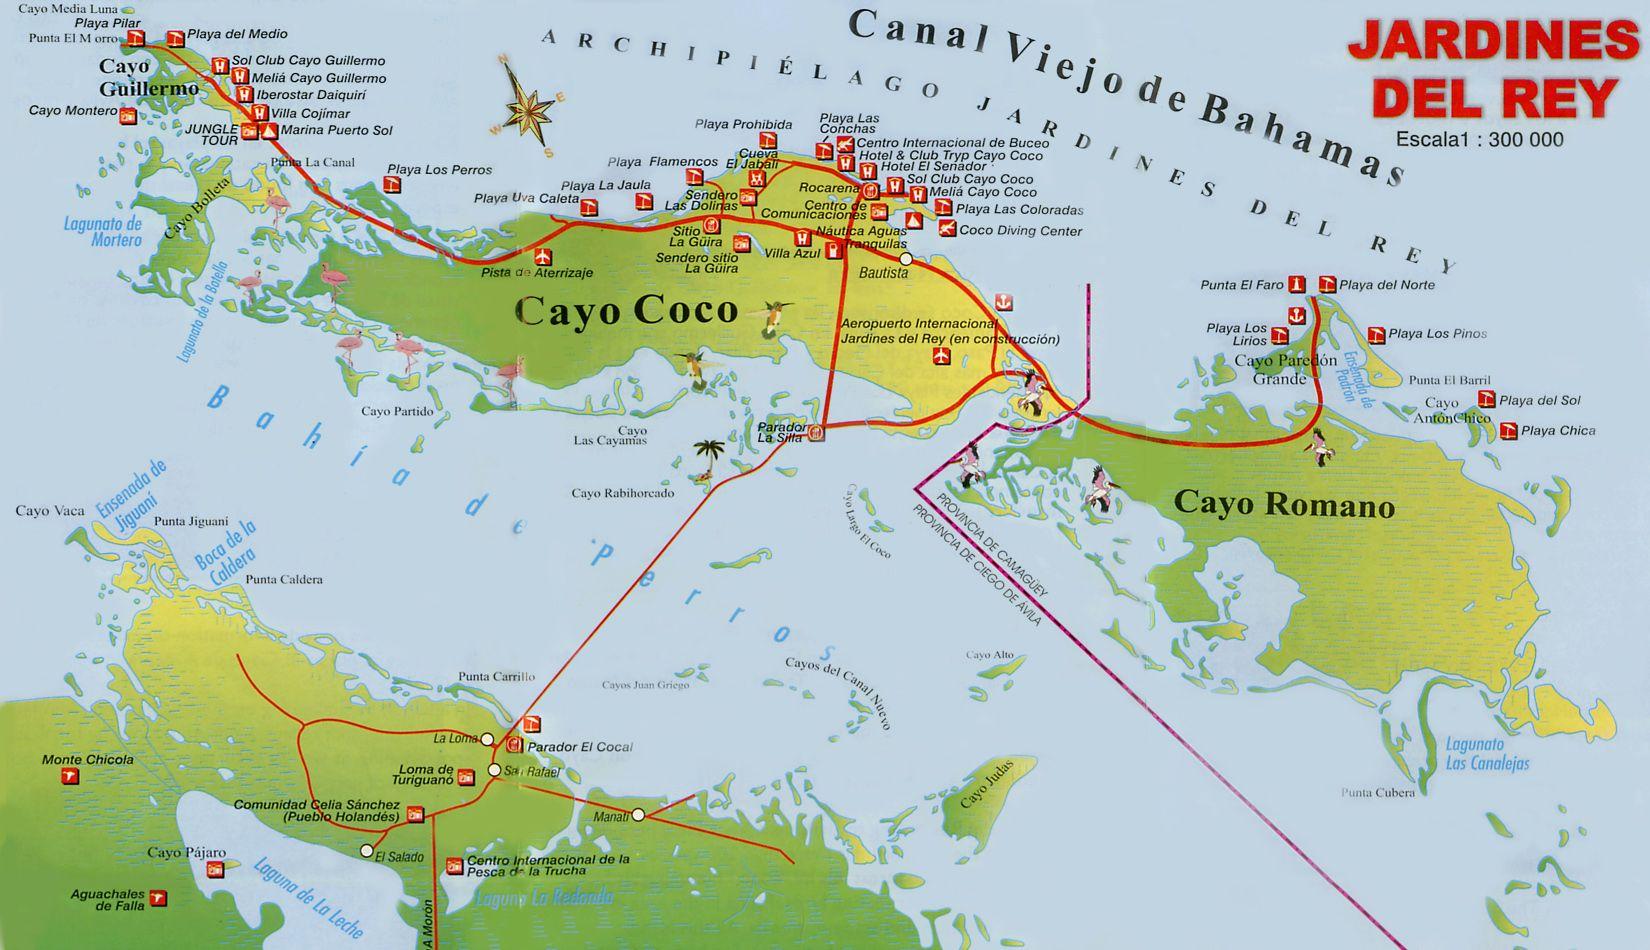 Cayo Coco Cuba Dream Places Good Vibes Pinterest Cayo Coco - Cuba provinces map